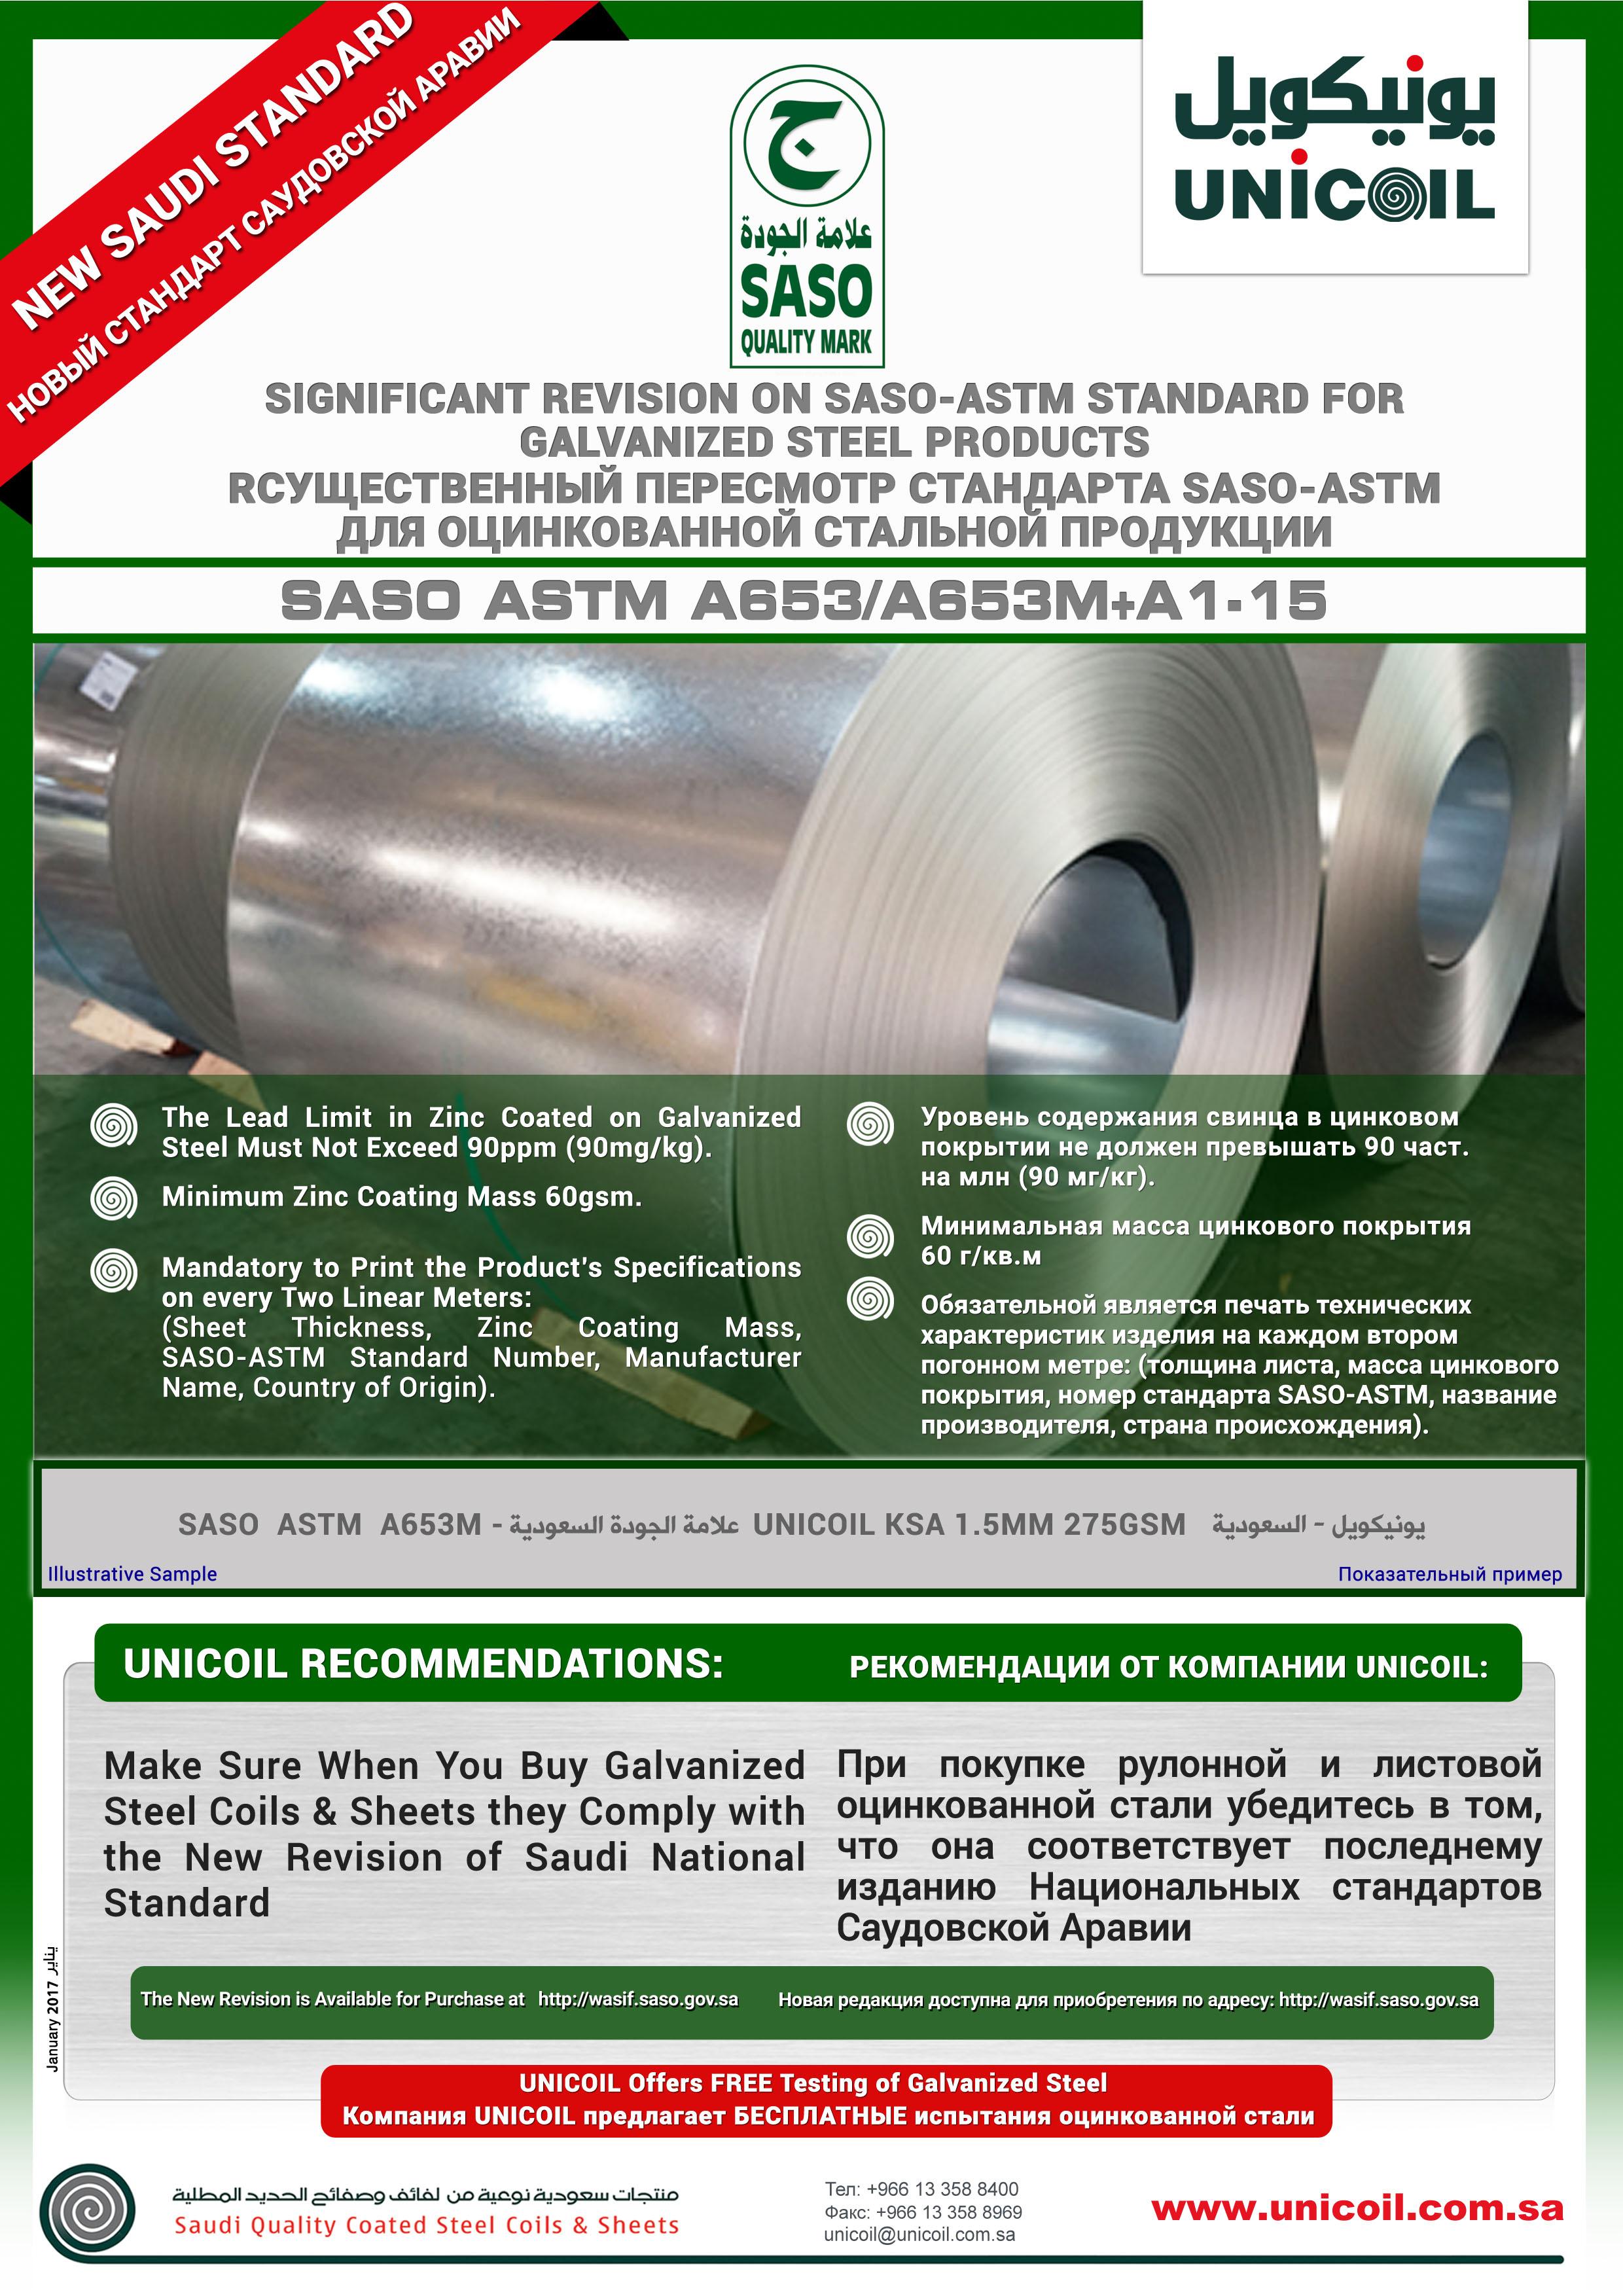 SASO ASTM New Revision